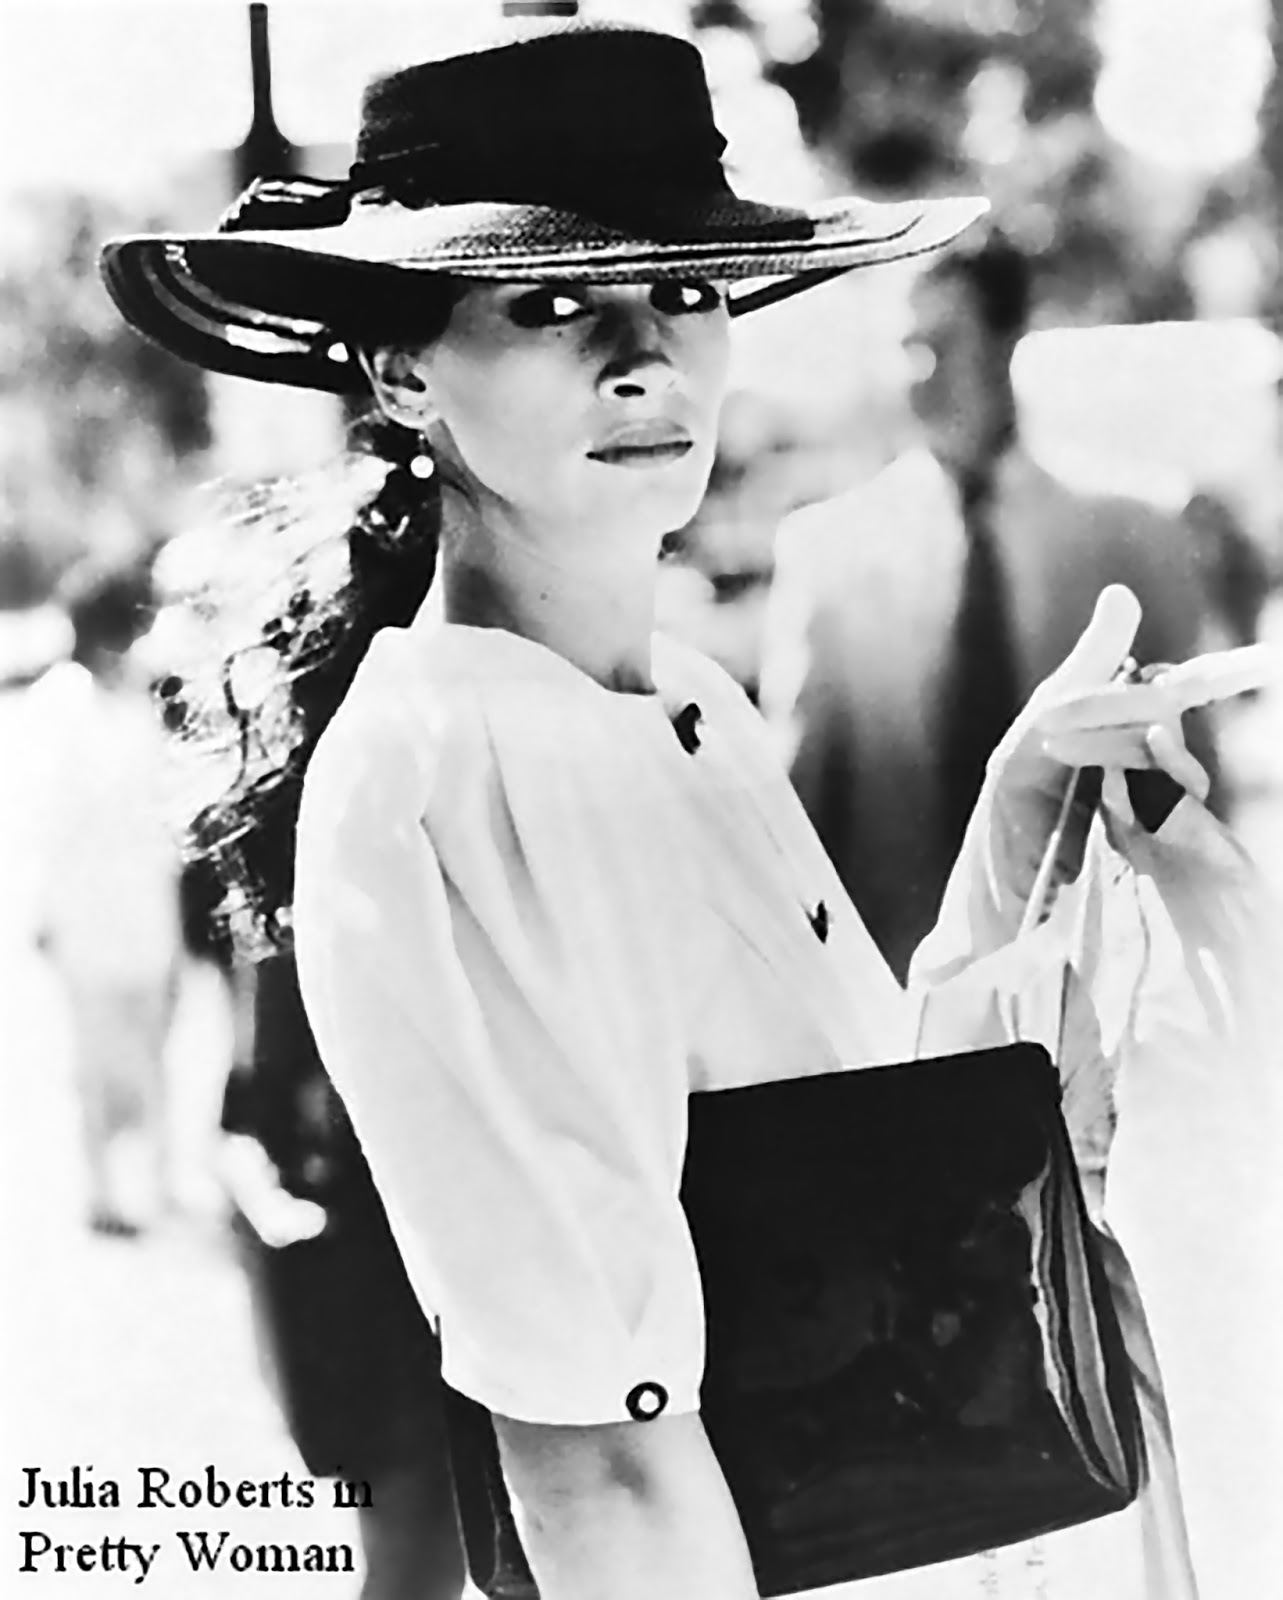 http://2.bp.blogspot.com/-qYfOForkhu0/URzYDOmVEoI/AAAAAAAAFtk/jNqC5Fzoeag/s1600/Julia+Roberts+in+Pretty+Woman+con+un+cappellio+Memar.jpg